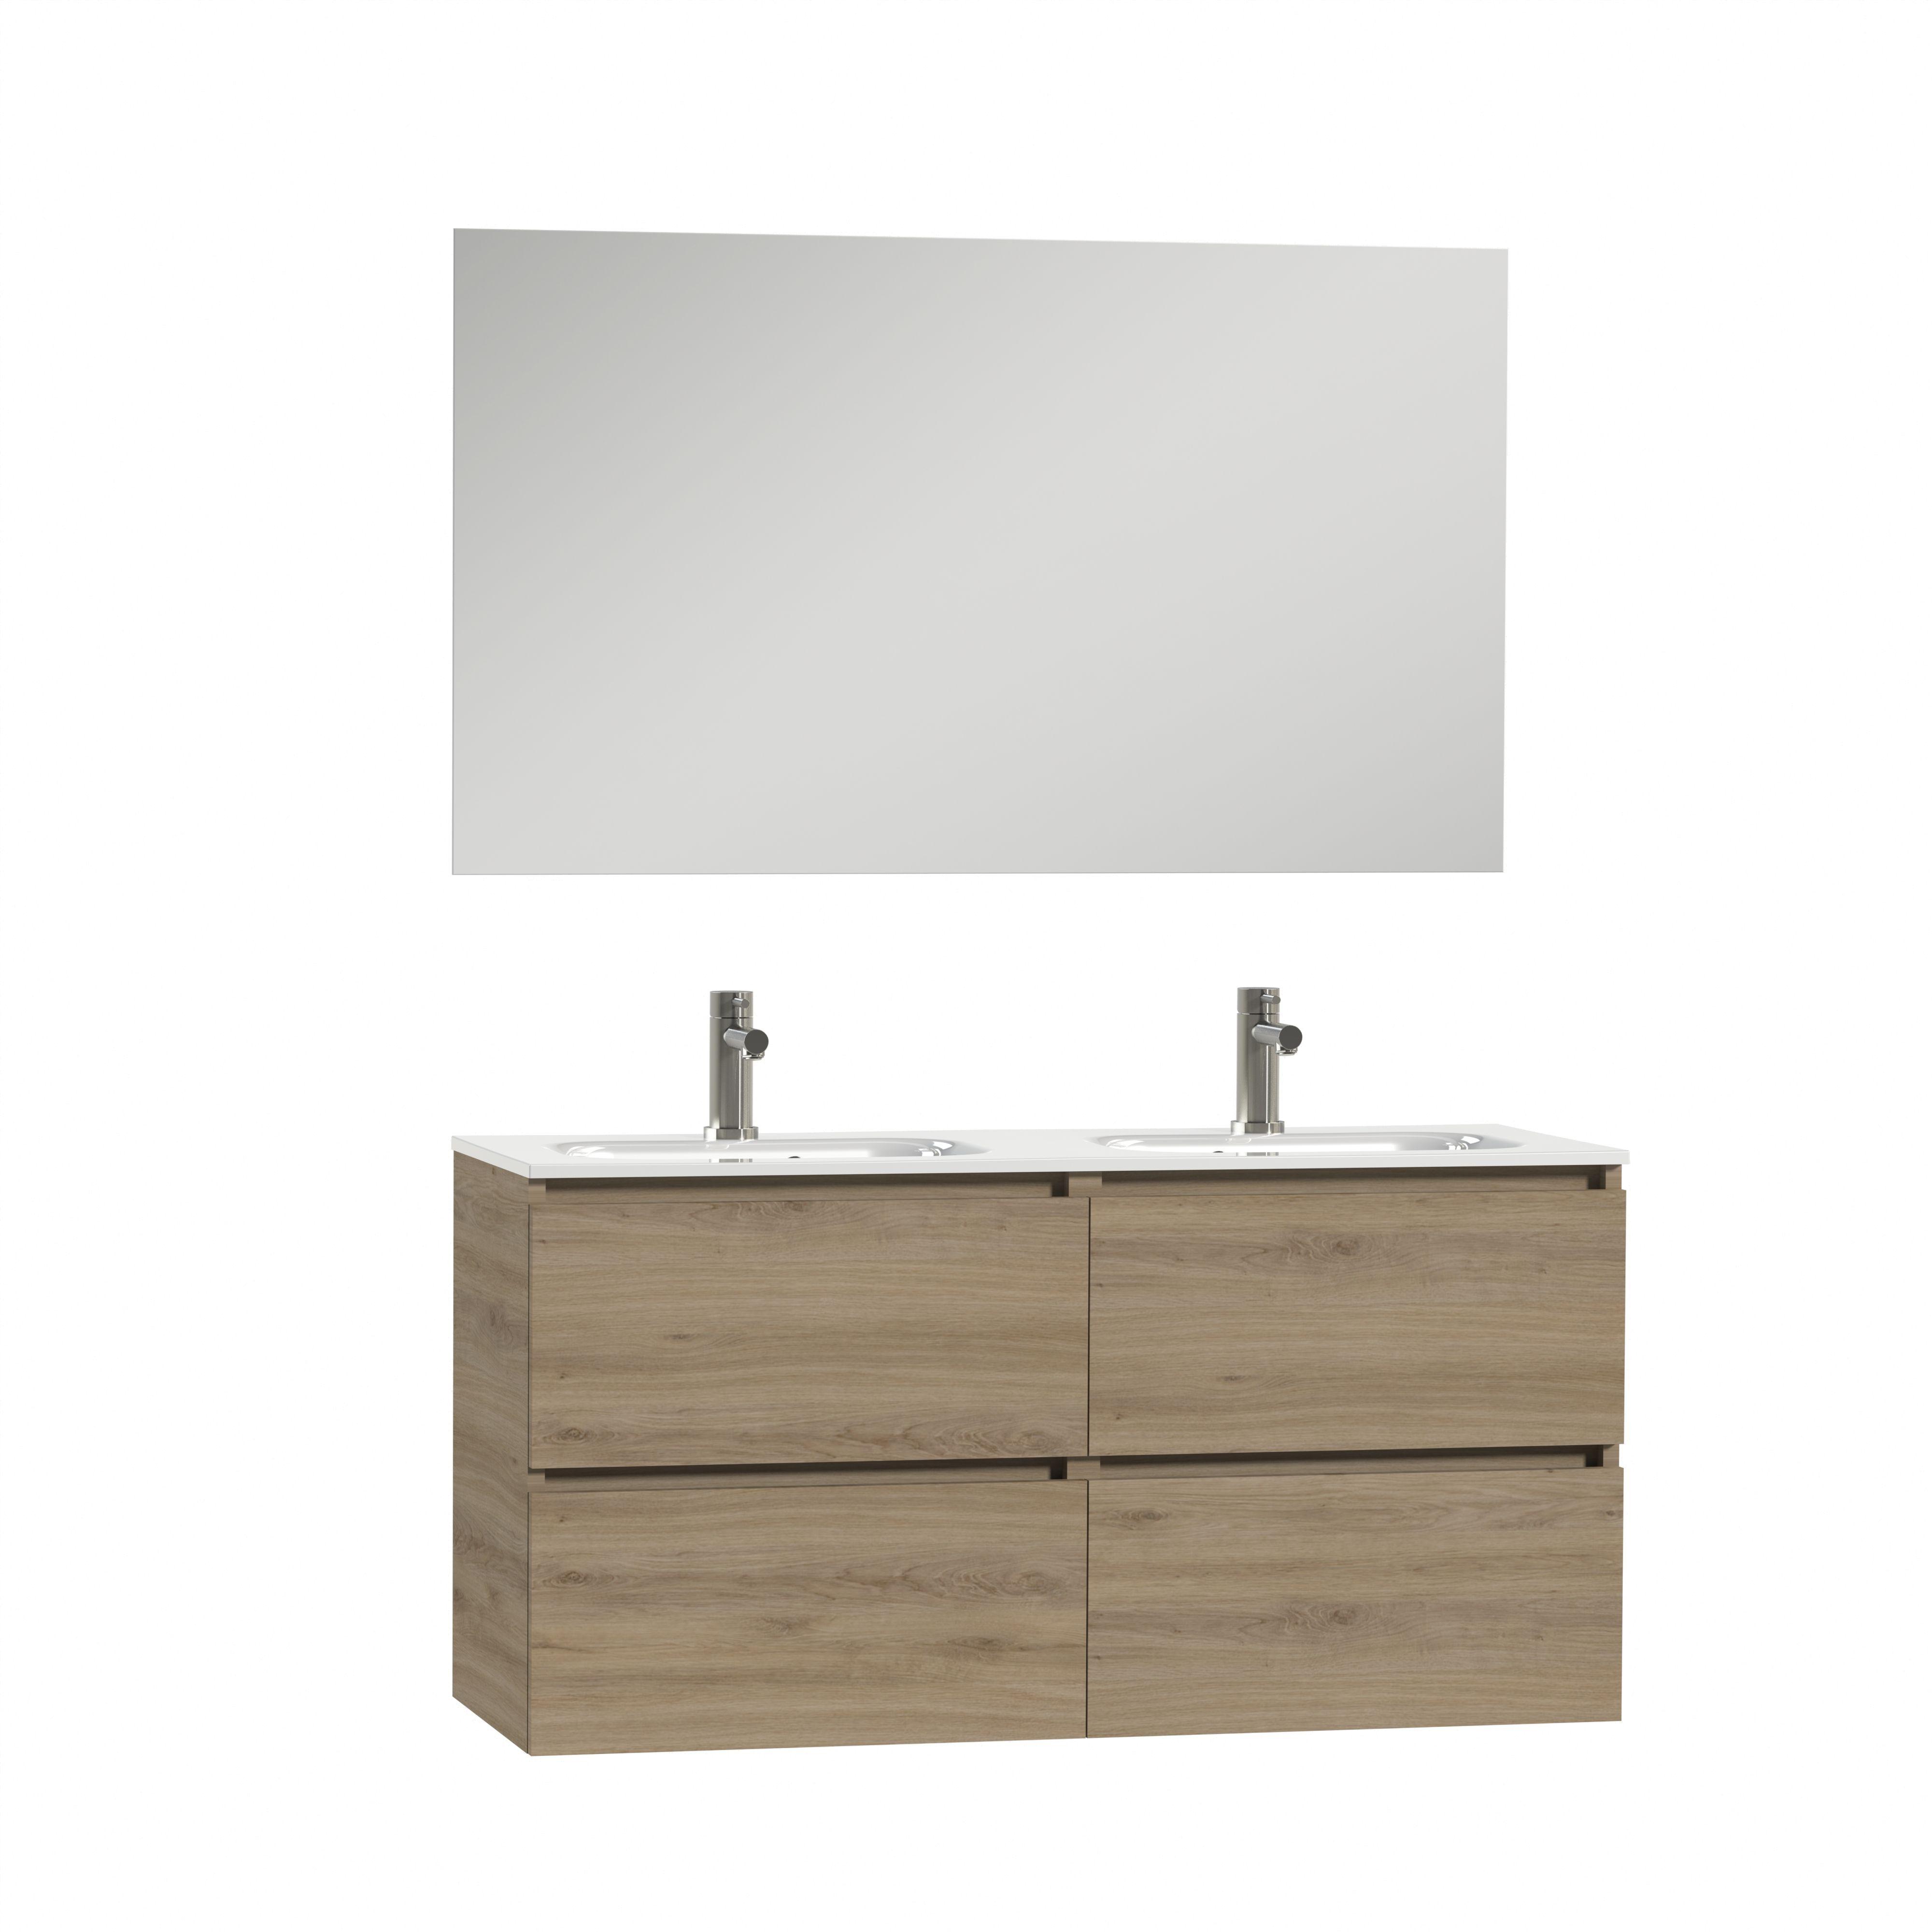 Tiger Loft dubbel badmeubel met spiegel en witte wastafel 120cm chalet eiken